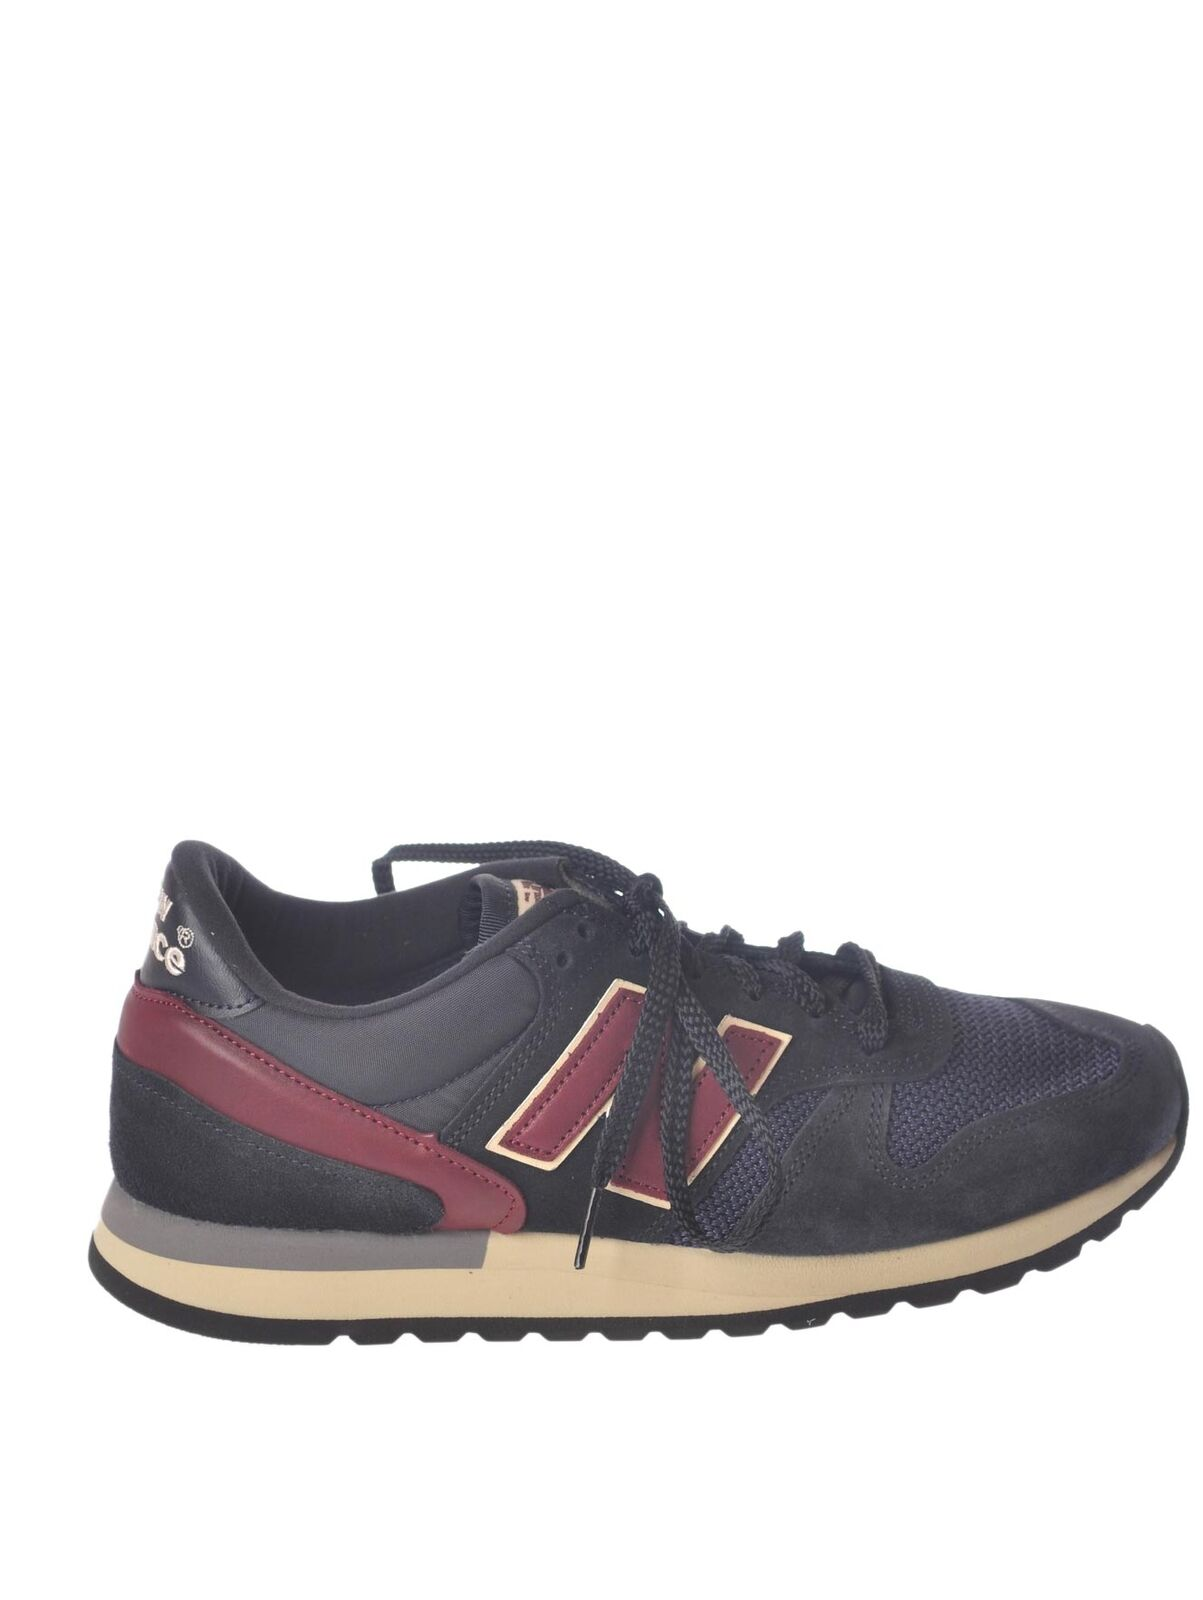 New Balance - - Shoes-Lace Up - Man - Balance Blue - 4369314B180313 11bbdf